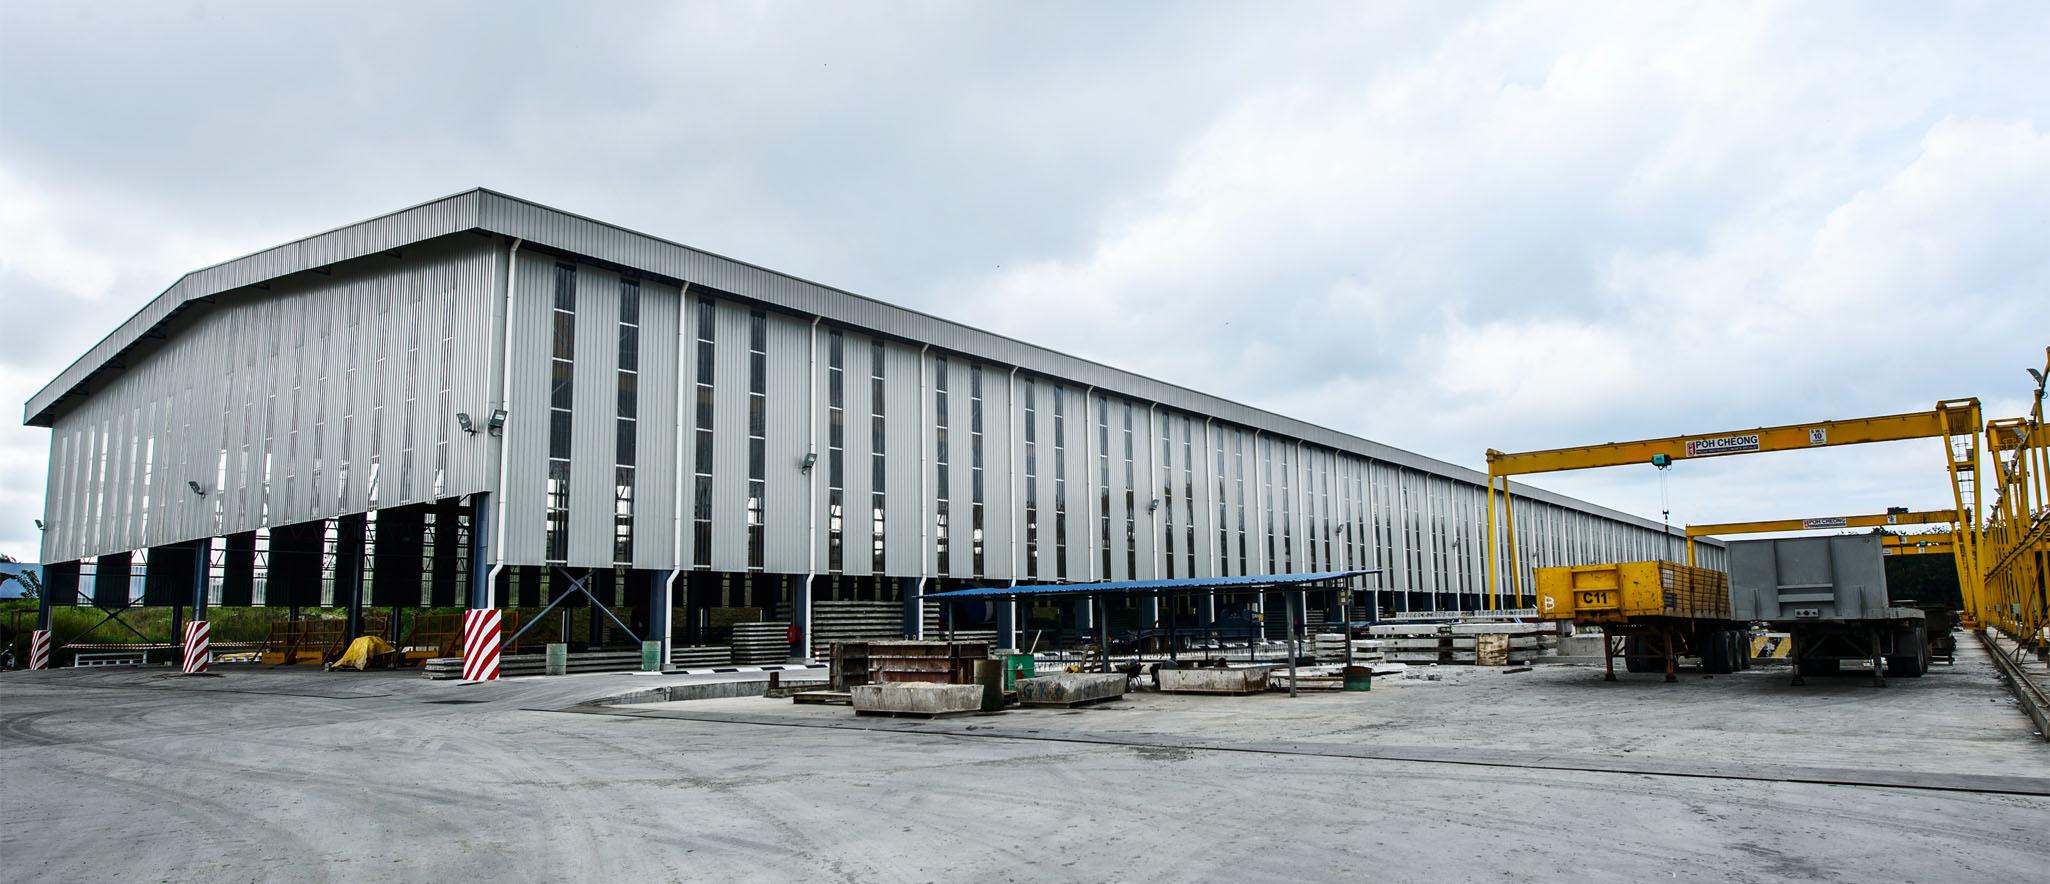 Precast Concrete Factory at Seelong Johor Bahru - Poh Cheong (M) Sdn Bhd